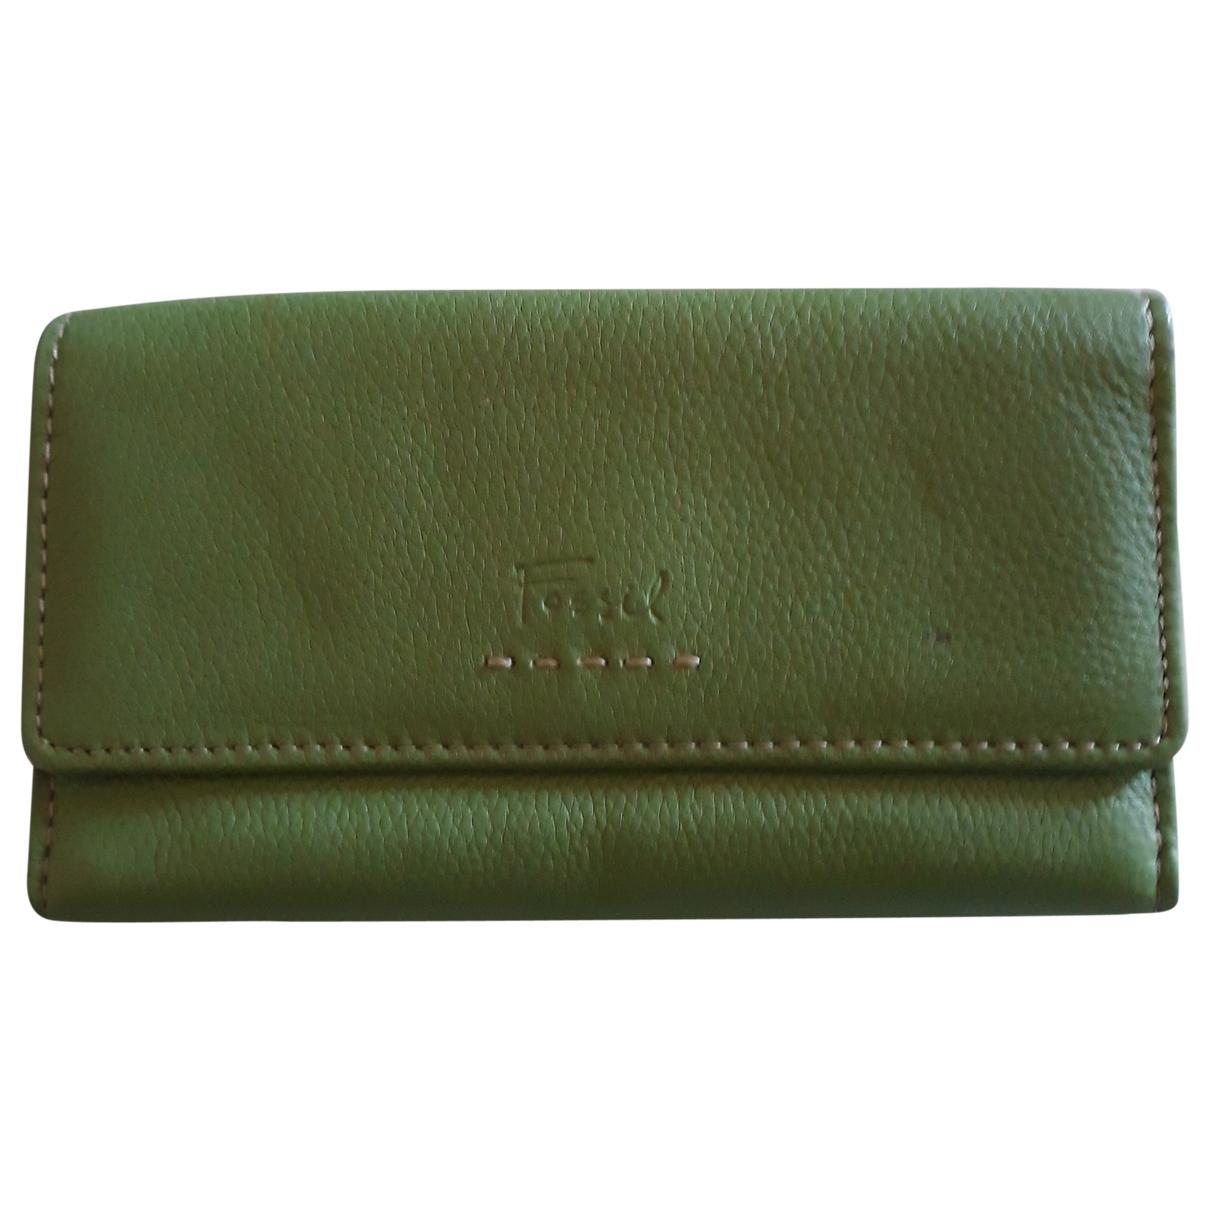 Non Signe / Unsigned \N Portemonnaie in  Gruen Leder